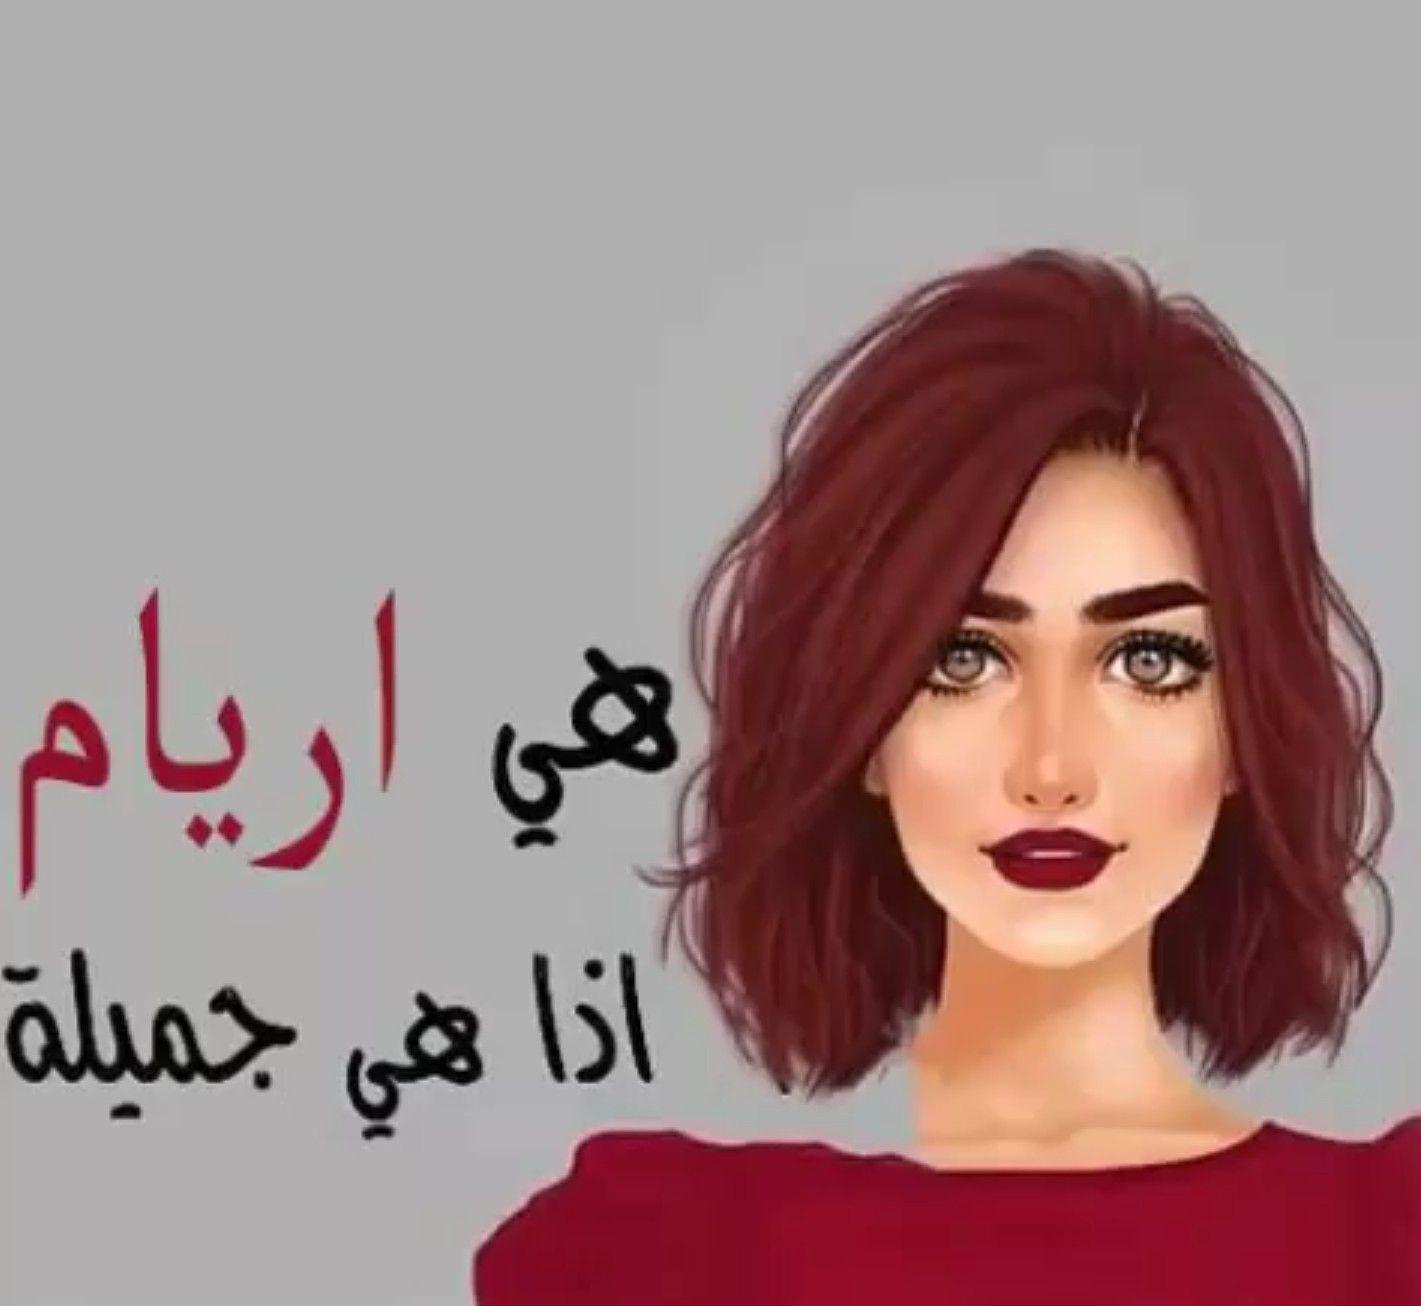 Pin By فلسطينية ولي الفخر On حروف أسماء واشكال مزخرفة Girly M Girly Girly Art